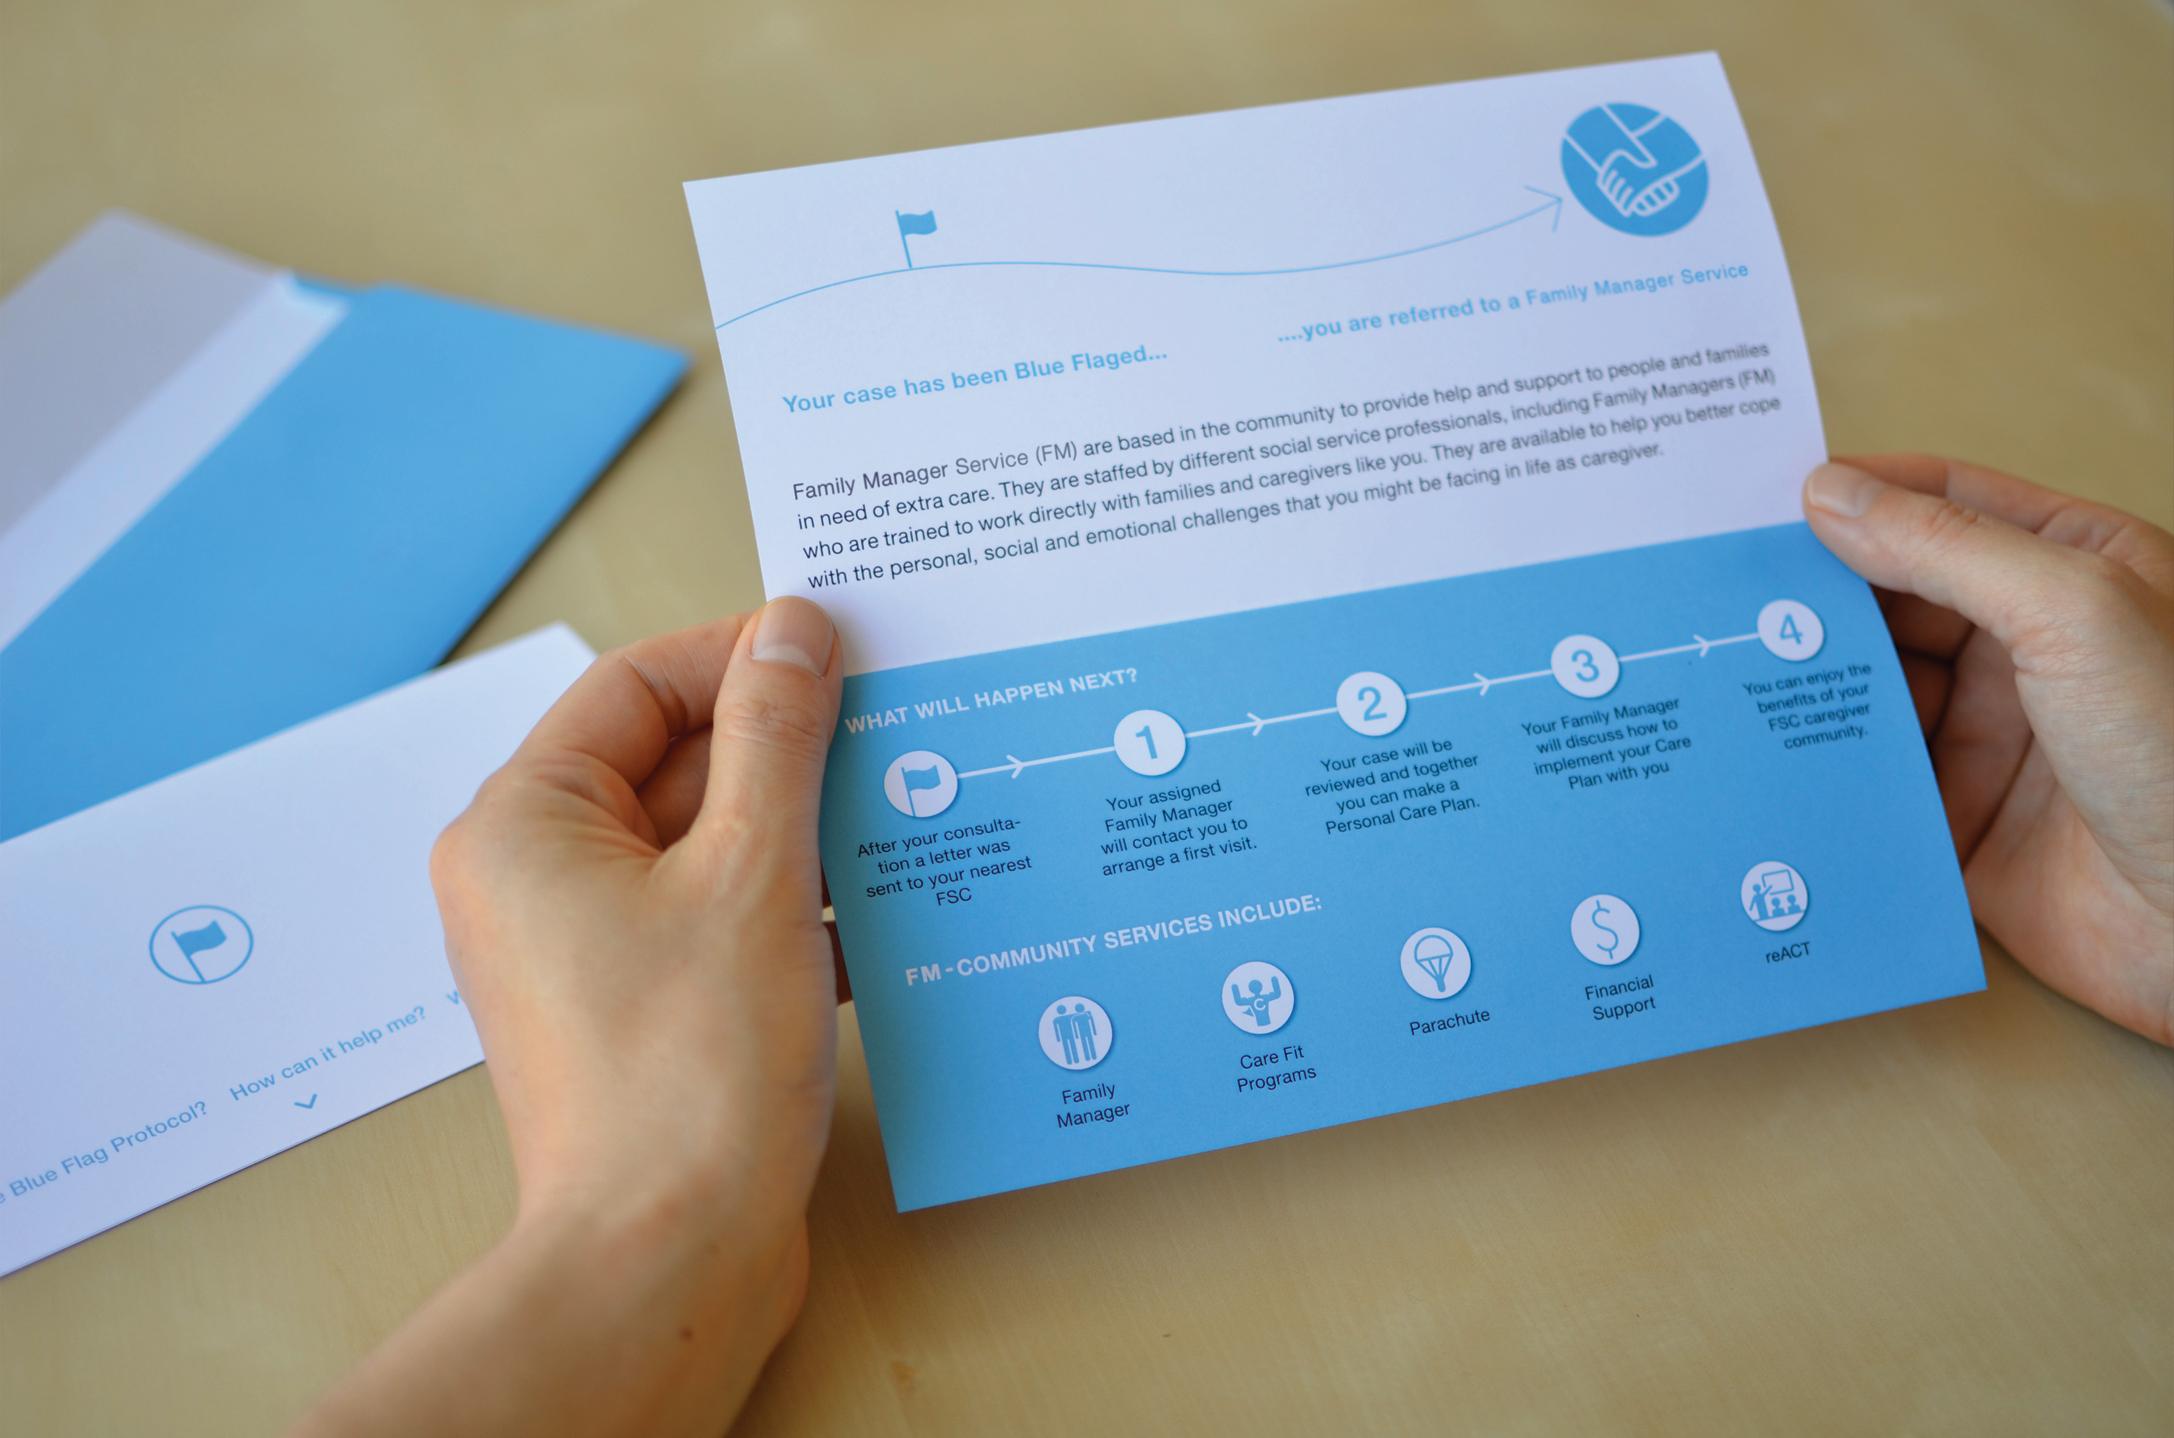 Blue Flag Protocol